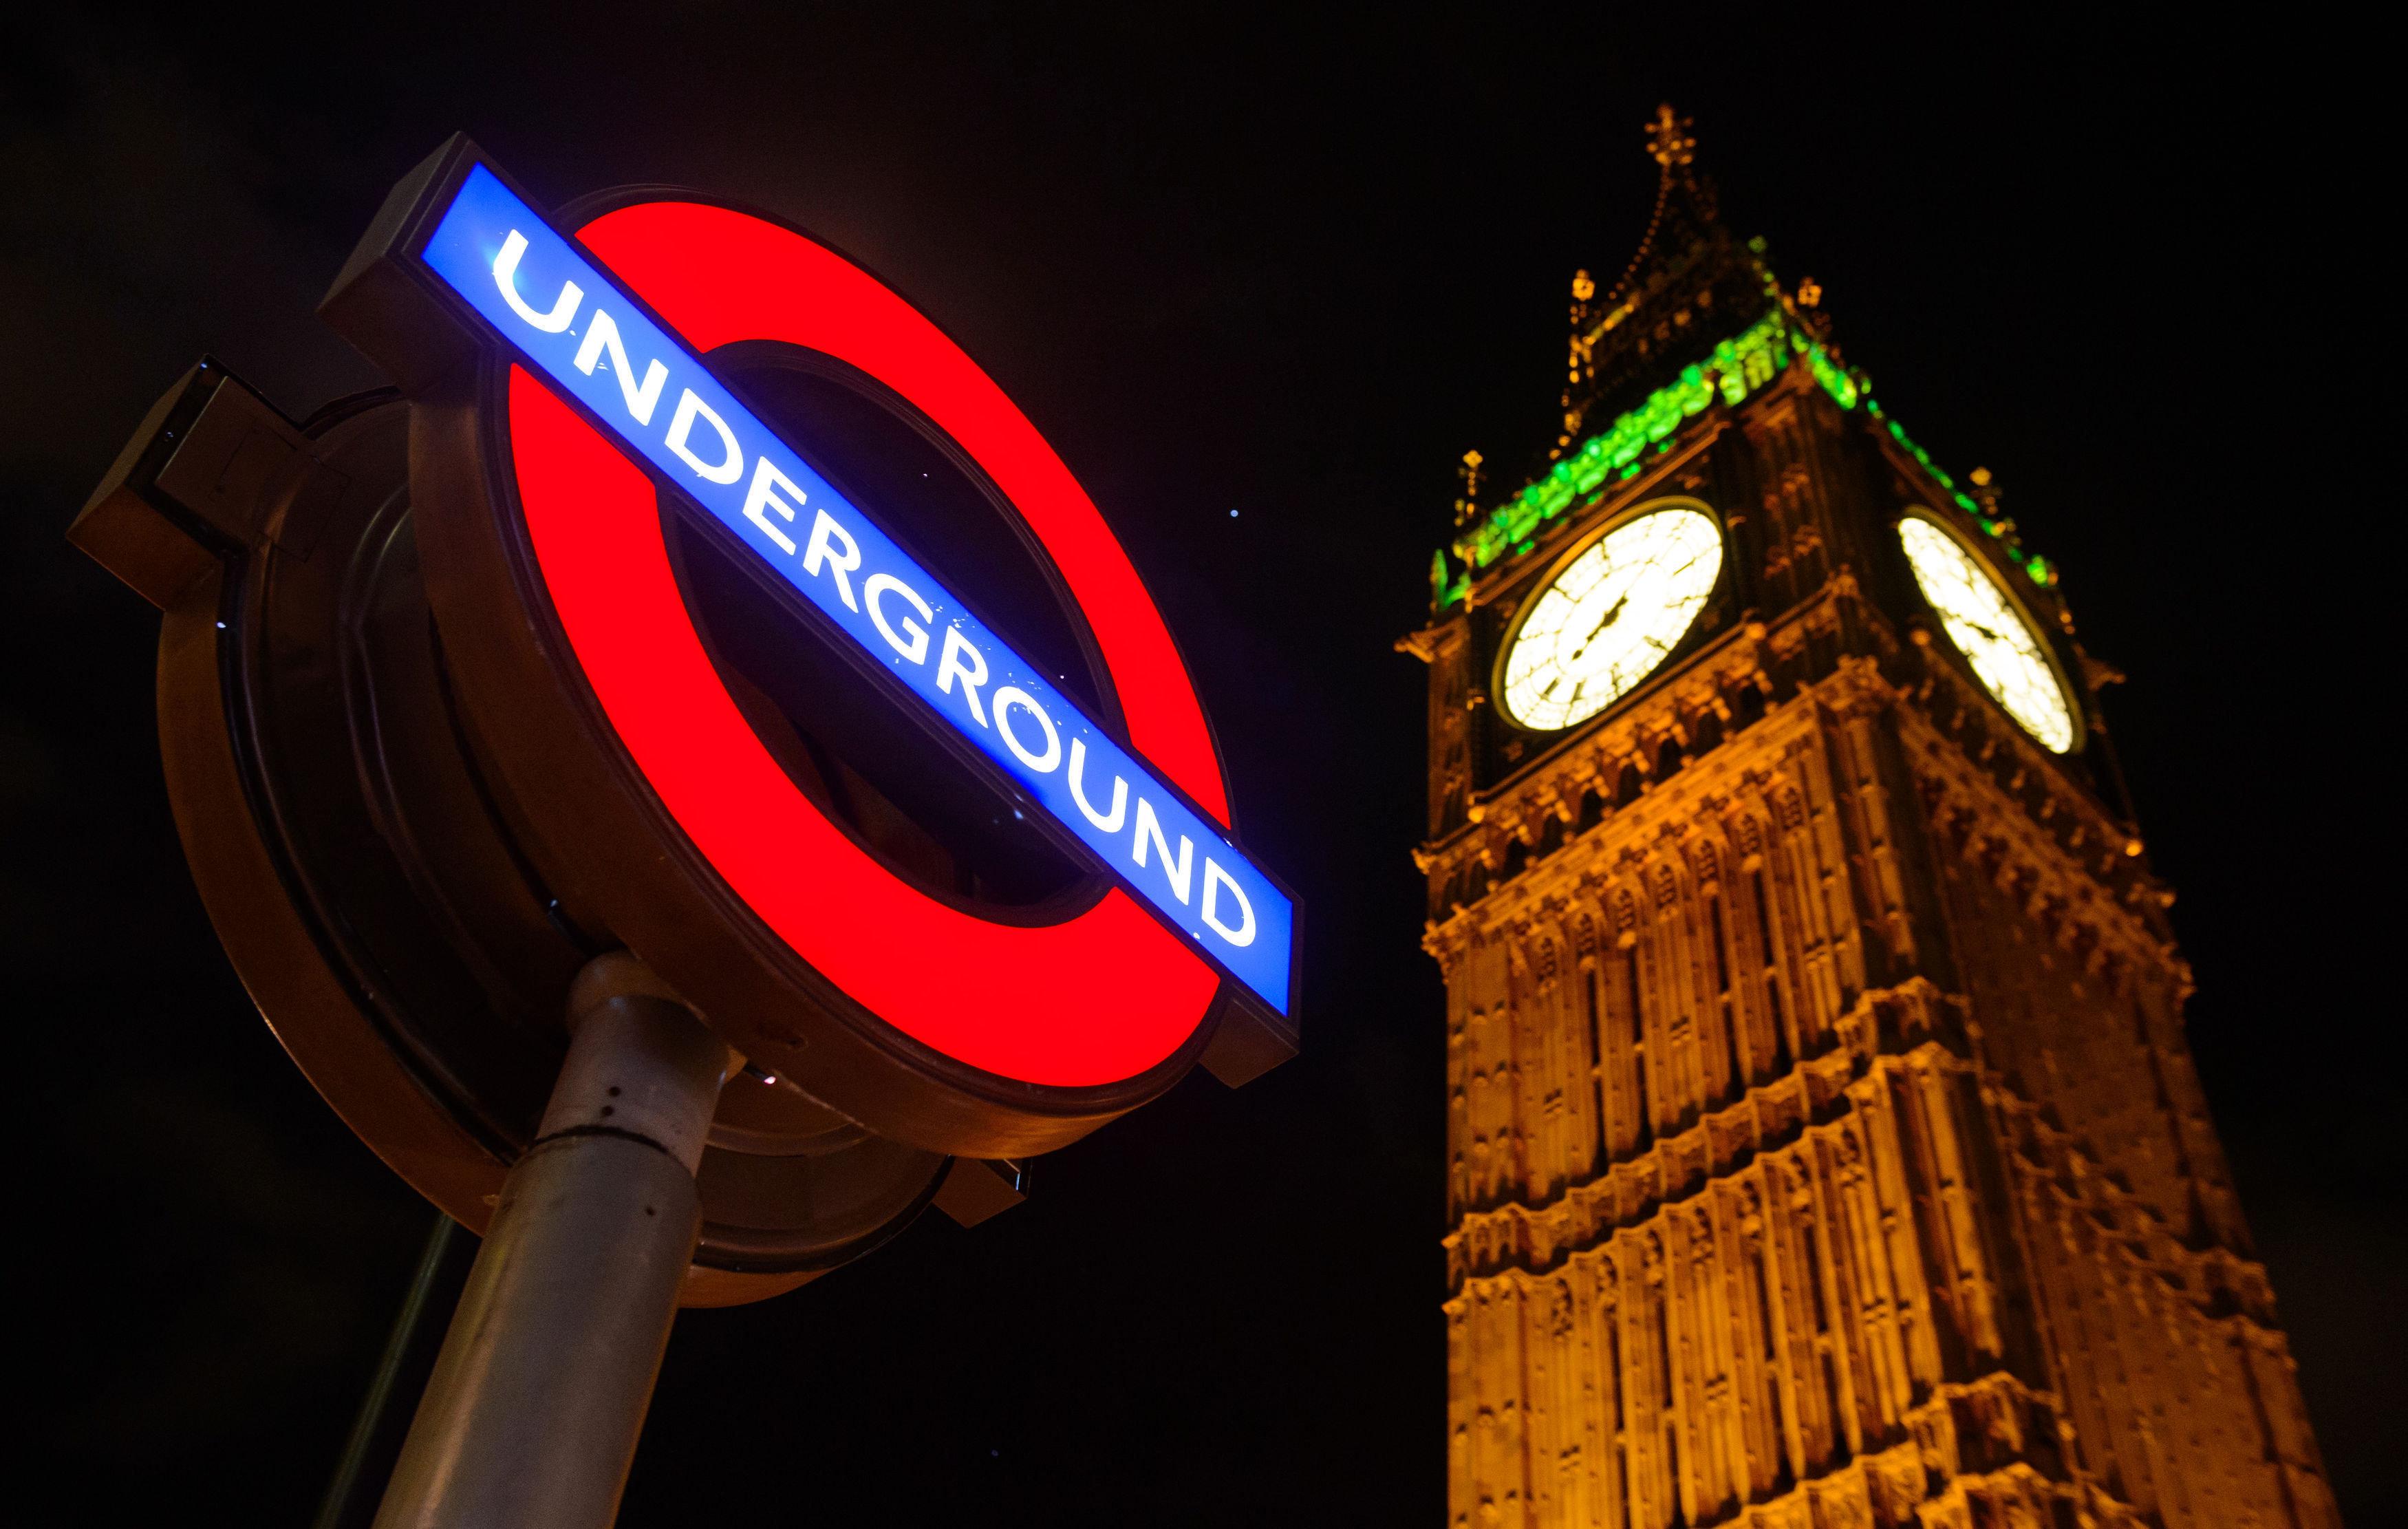 London Transport Free London travel maps